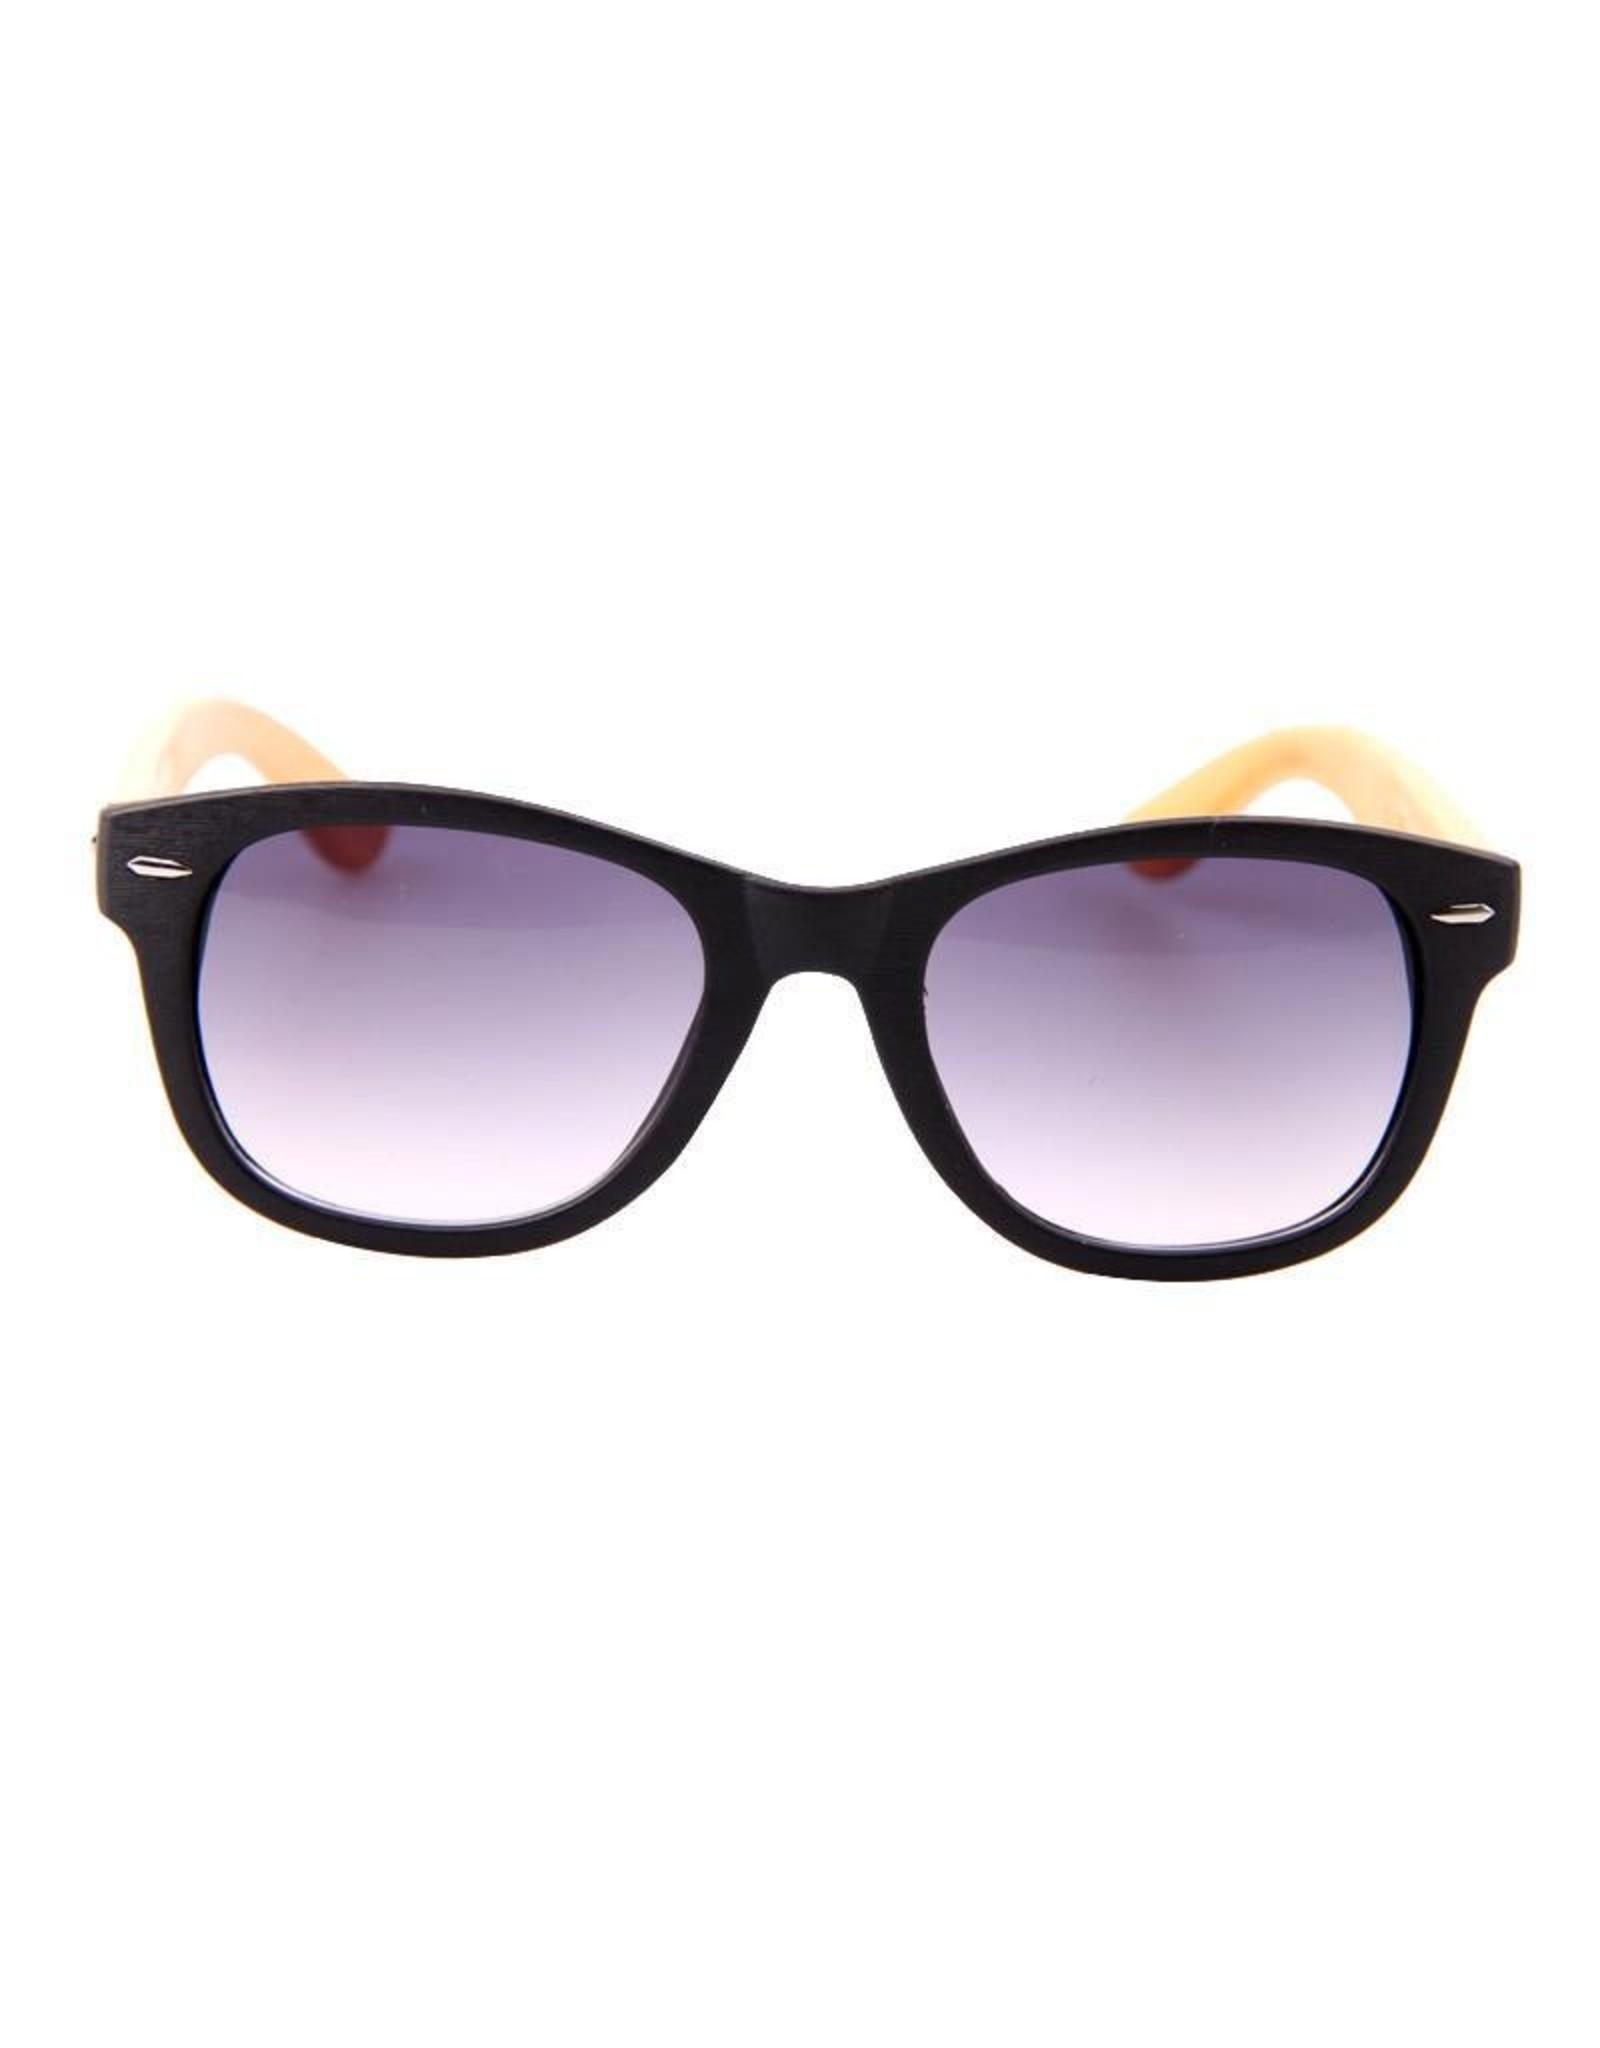 Kuma Eyewear - Arbutus Sunglasses